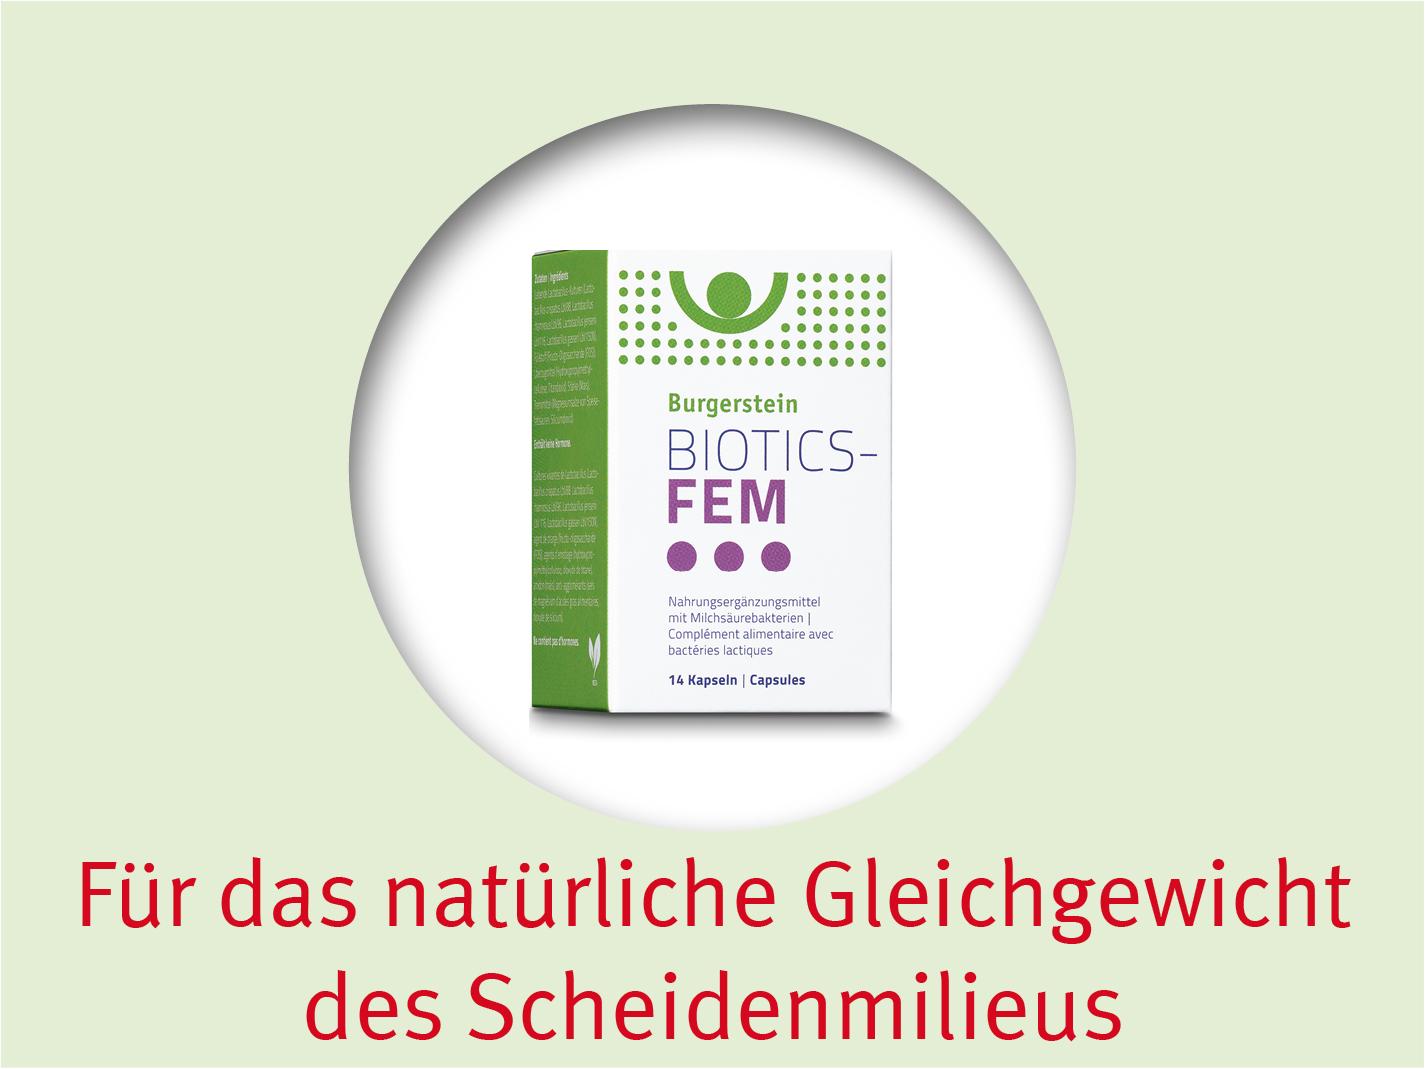 biotics-fem_teaserbox.jpg